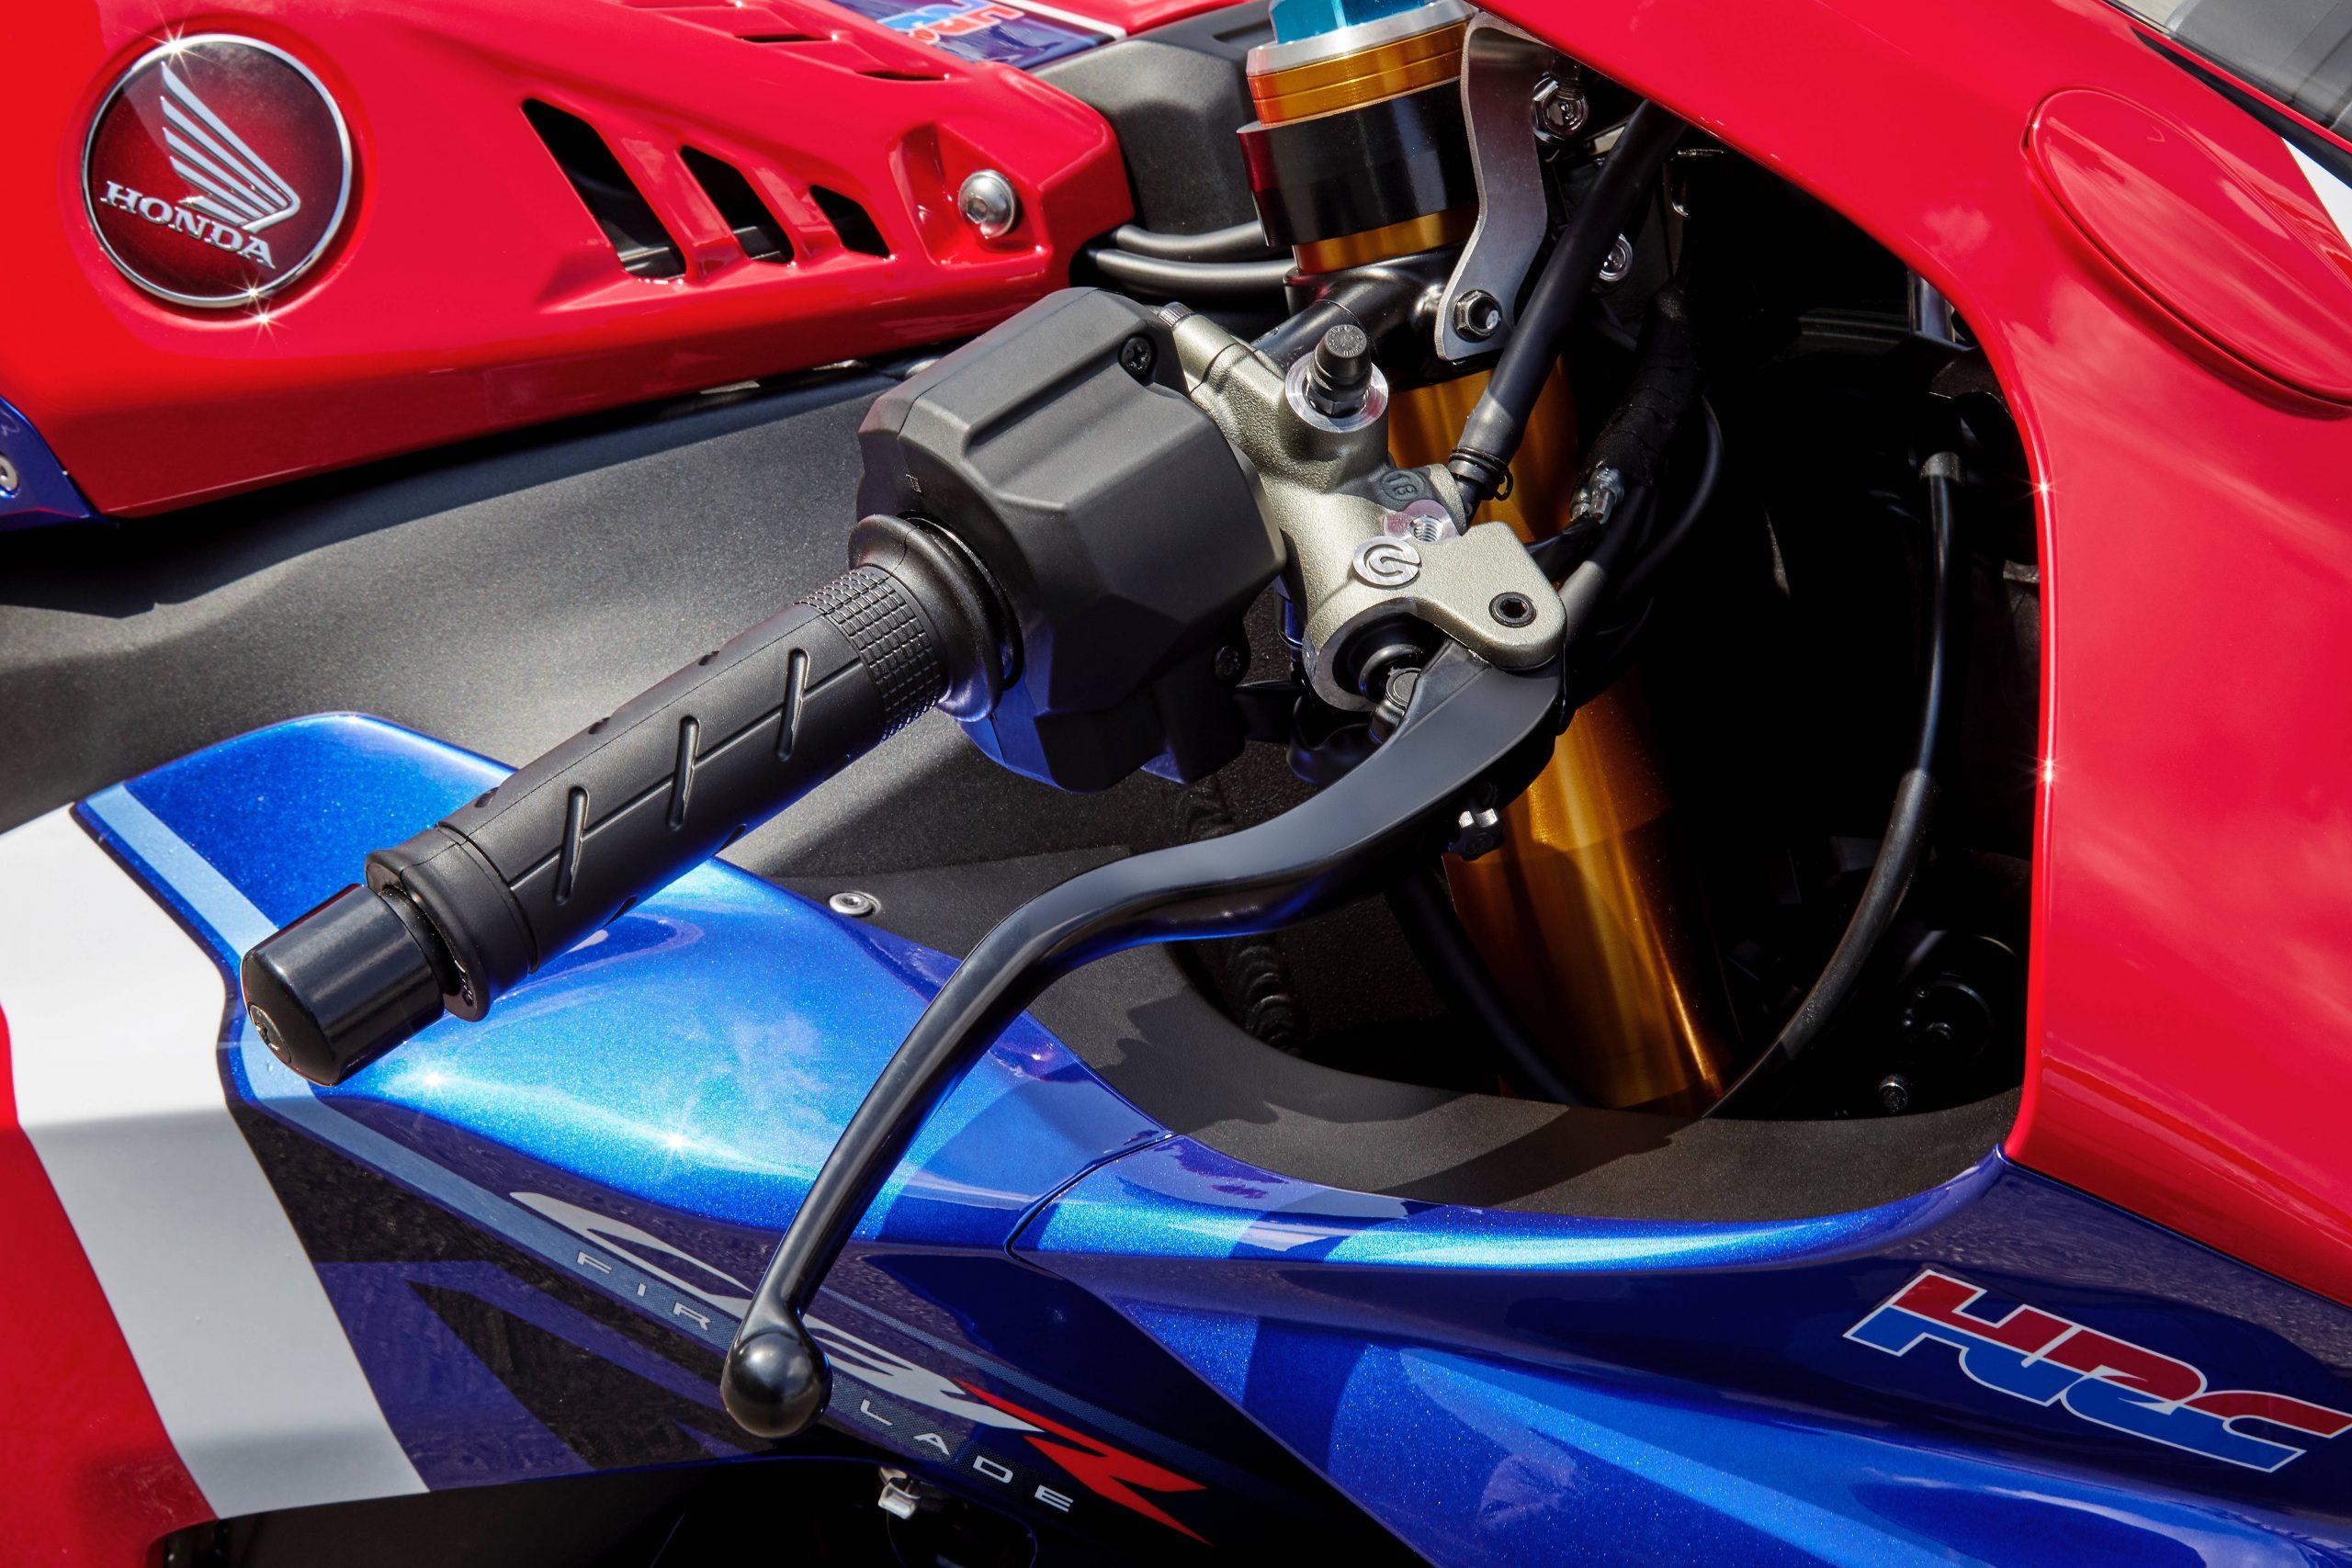 21 Honda CBR1000RR-R Fireblade SP R handlebar